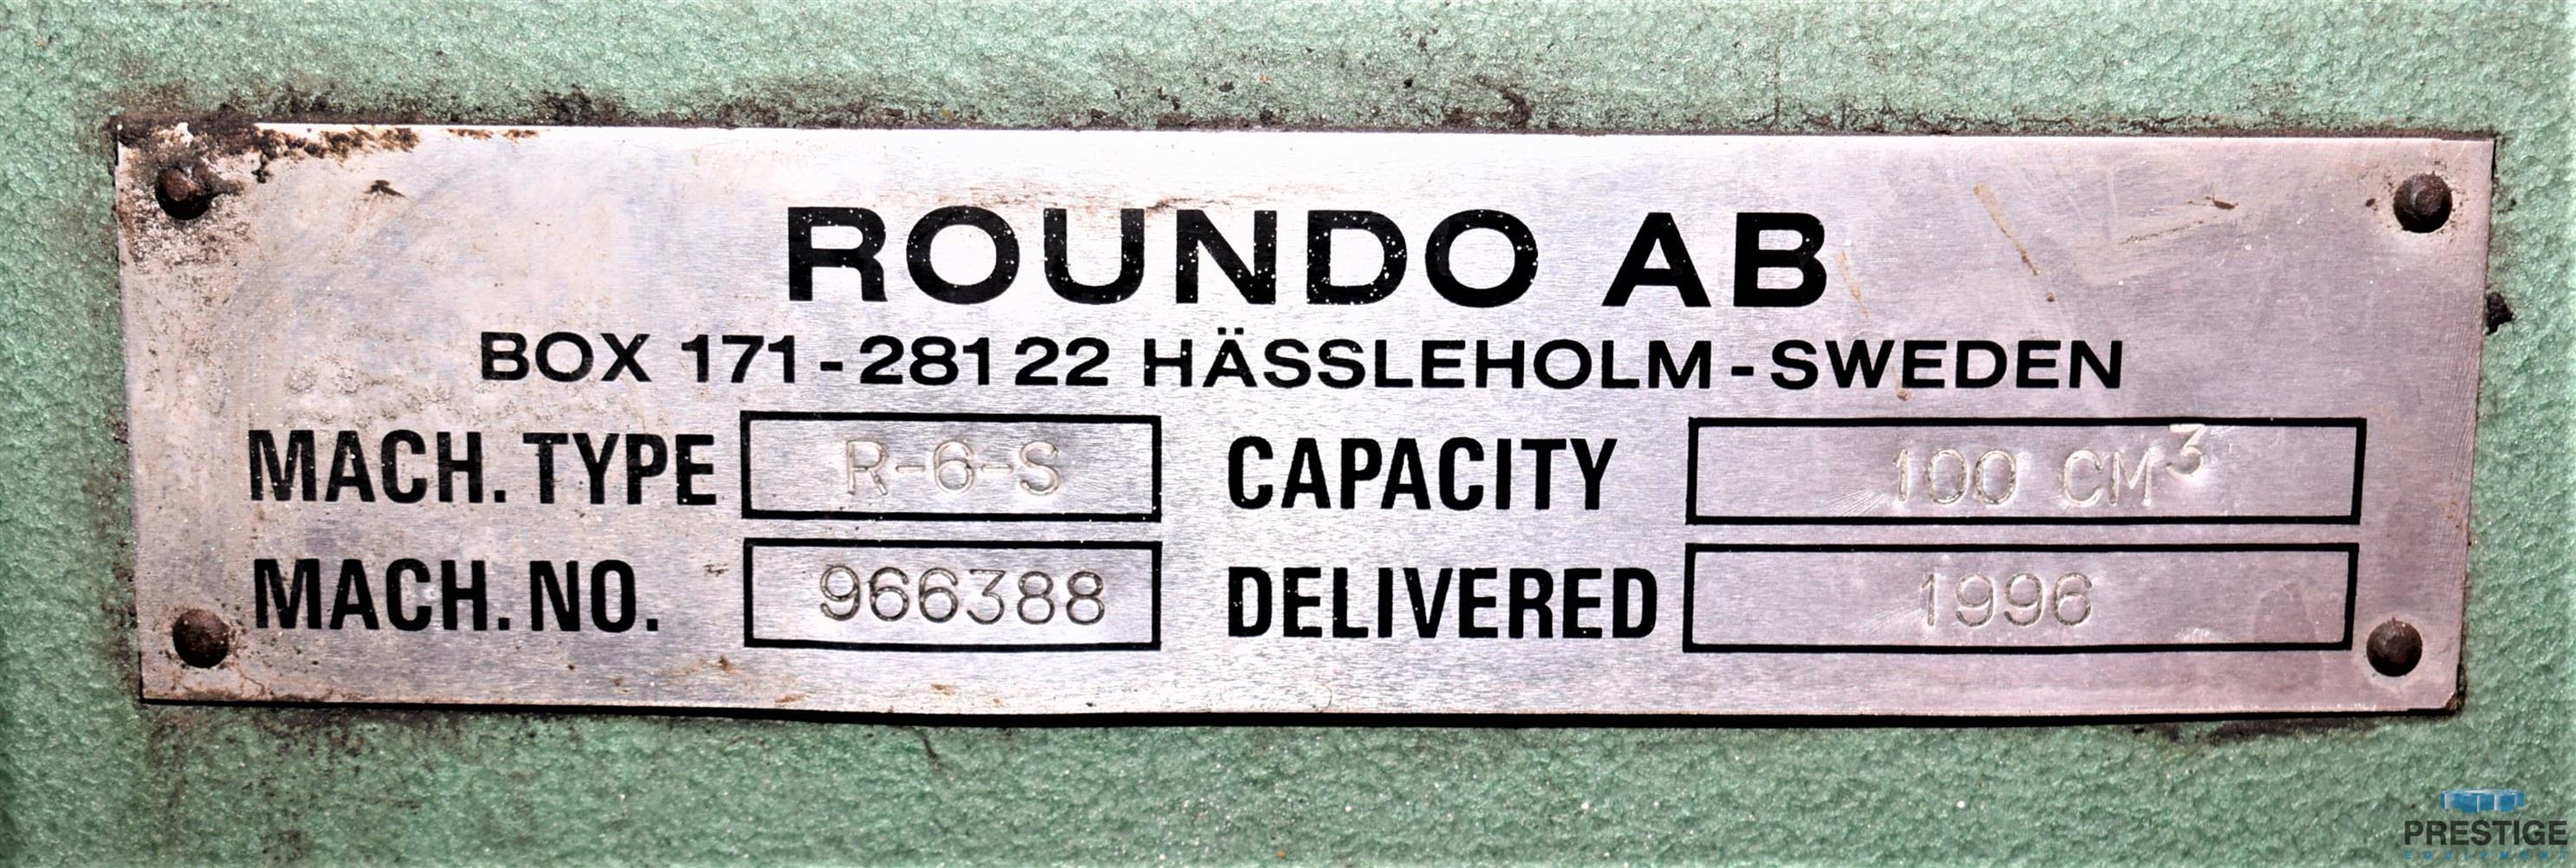 Roundo R6S 152 MM  x 152 MM  x 16 MM  Horizontal Angle Bending Roll-31504g